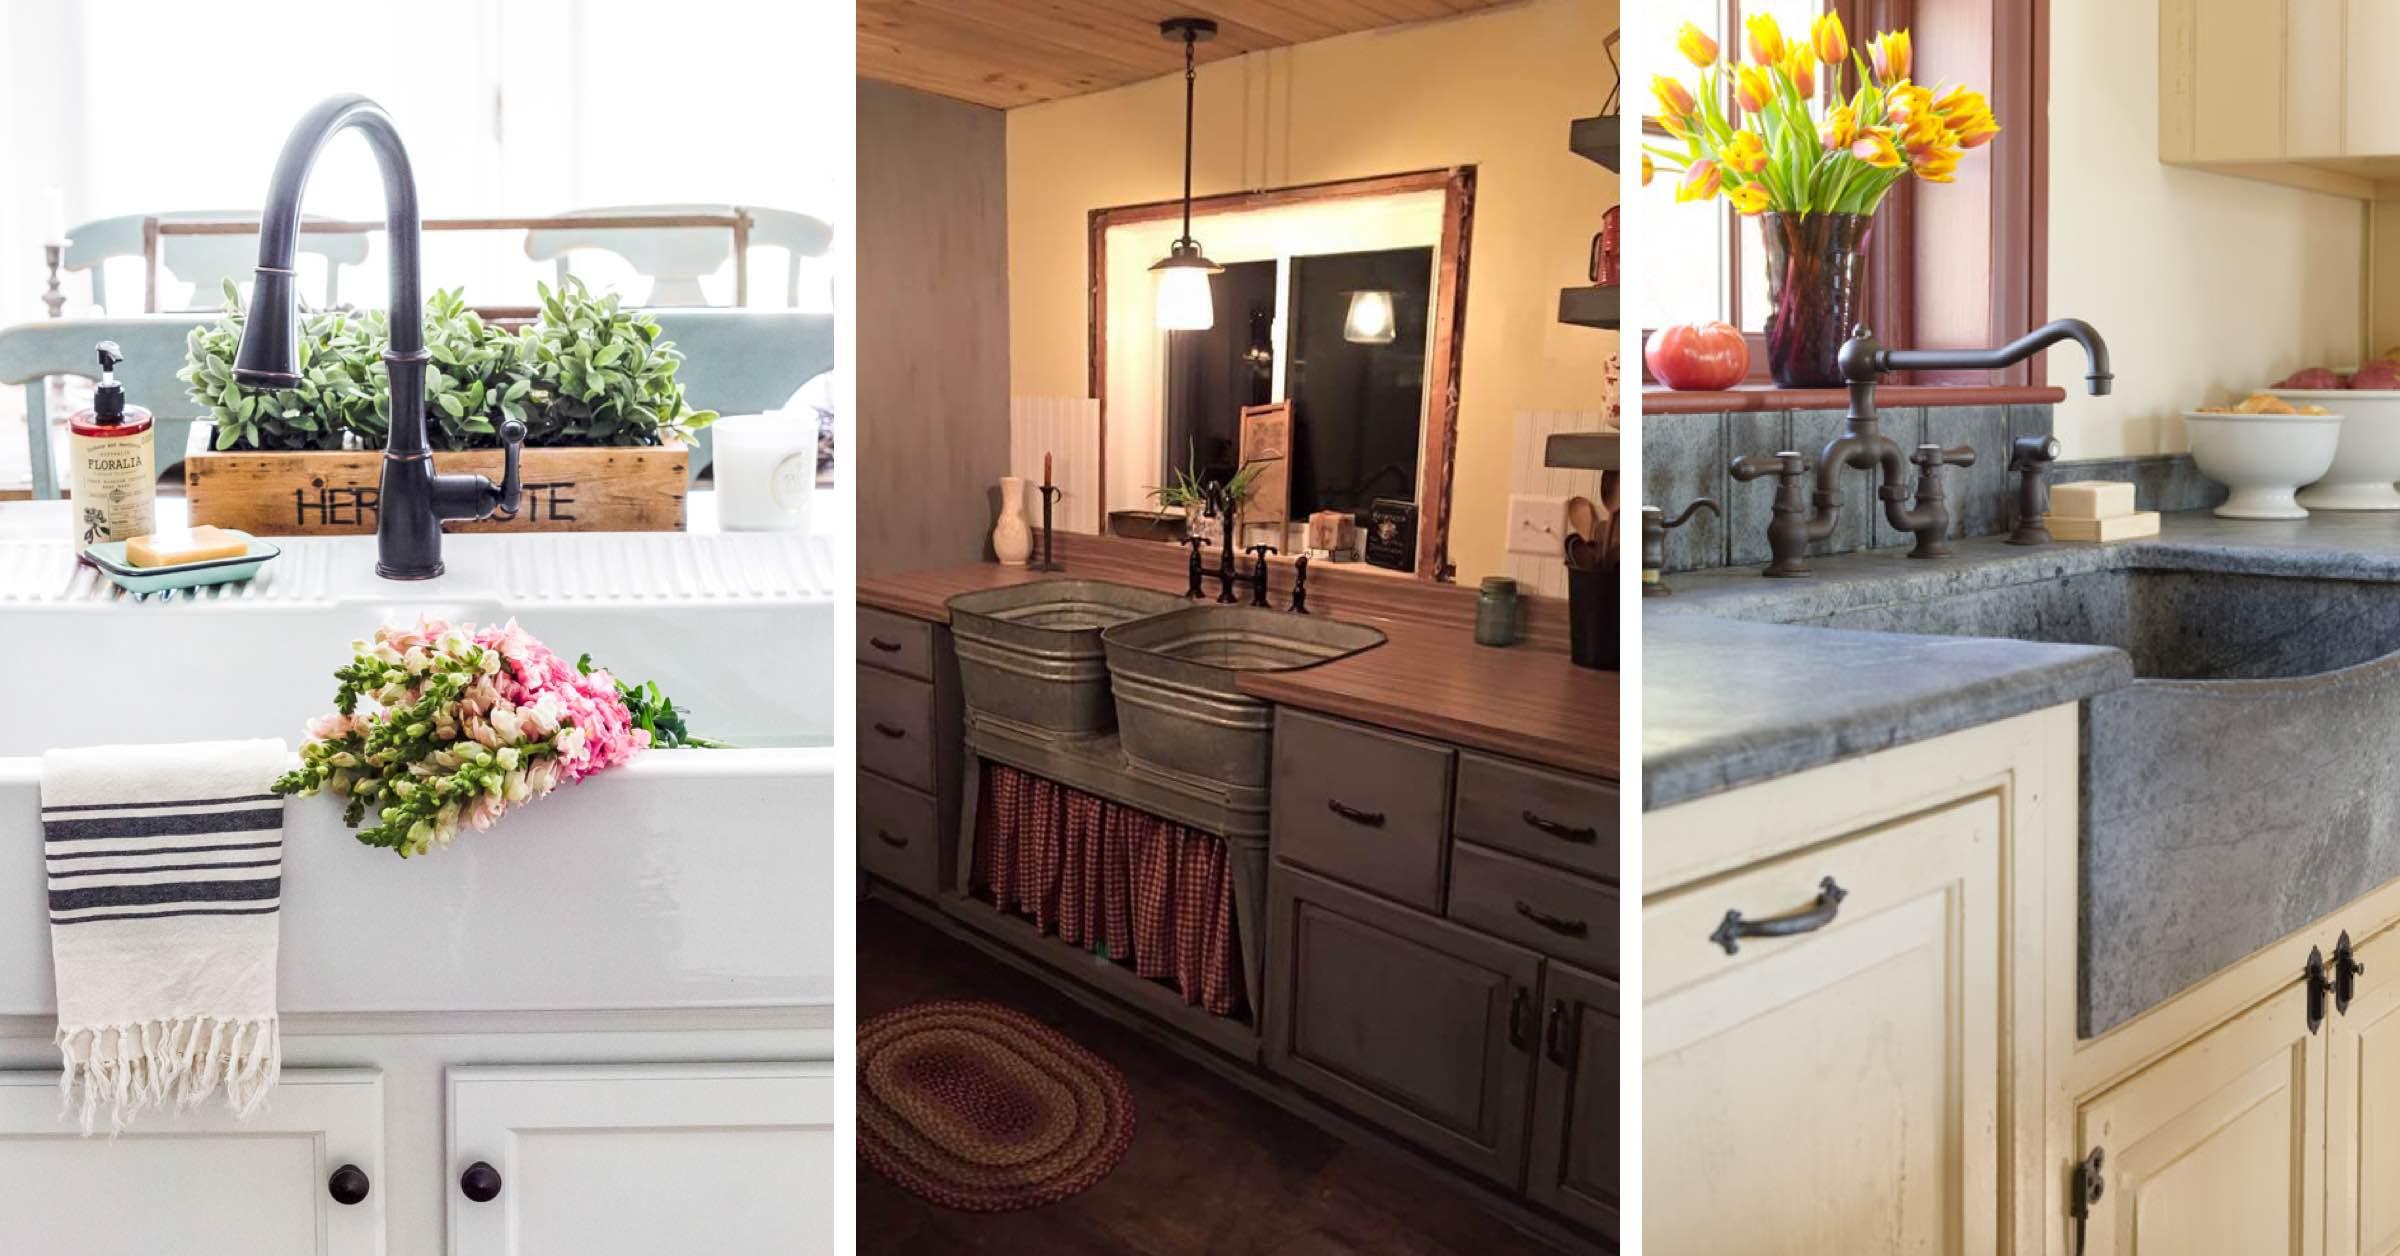 19 Cool Farmhouse Kitchen Sink Ideas That are Versatile ... on Kitchen Sink Ideas  id=86313